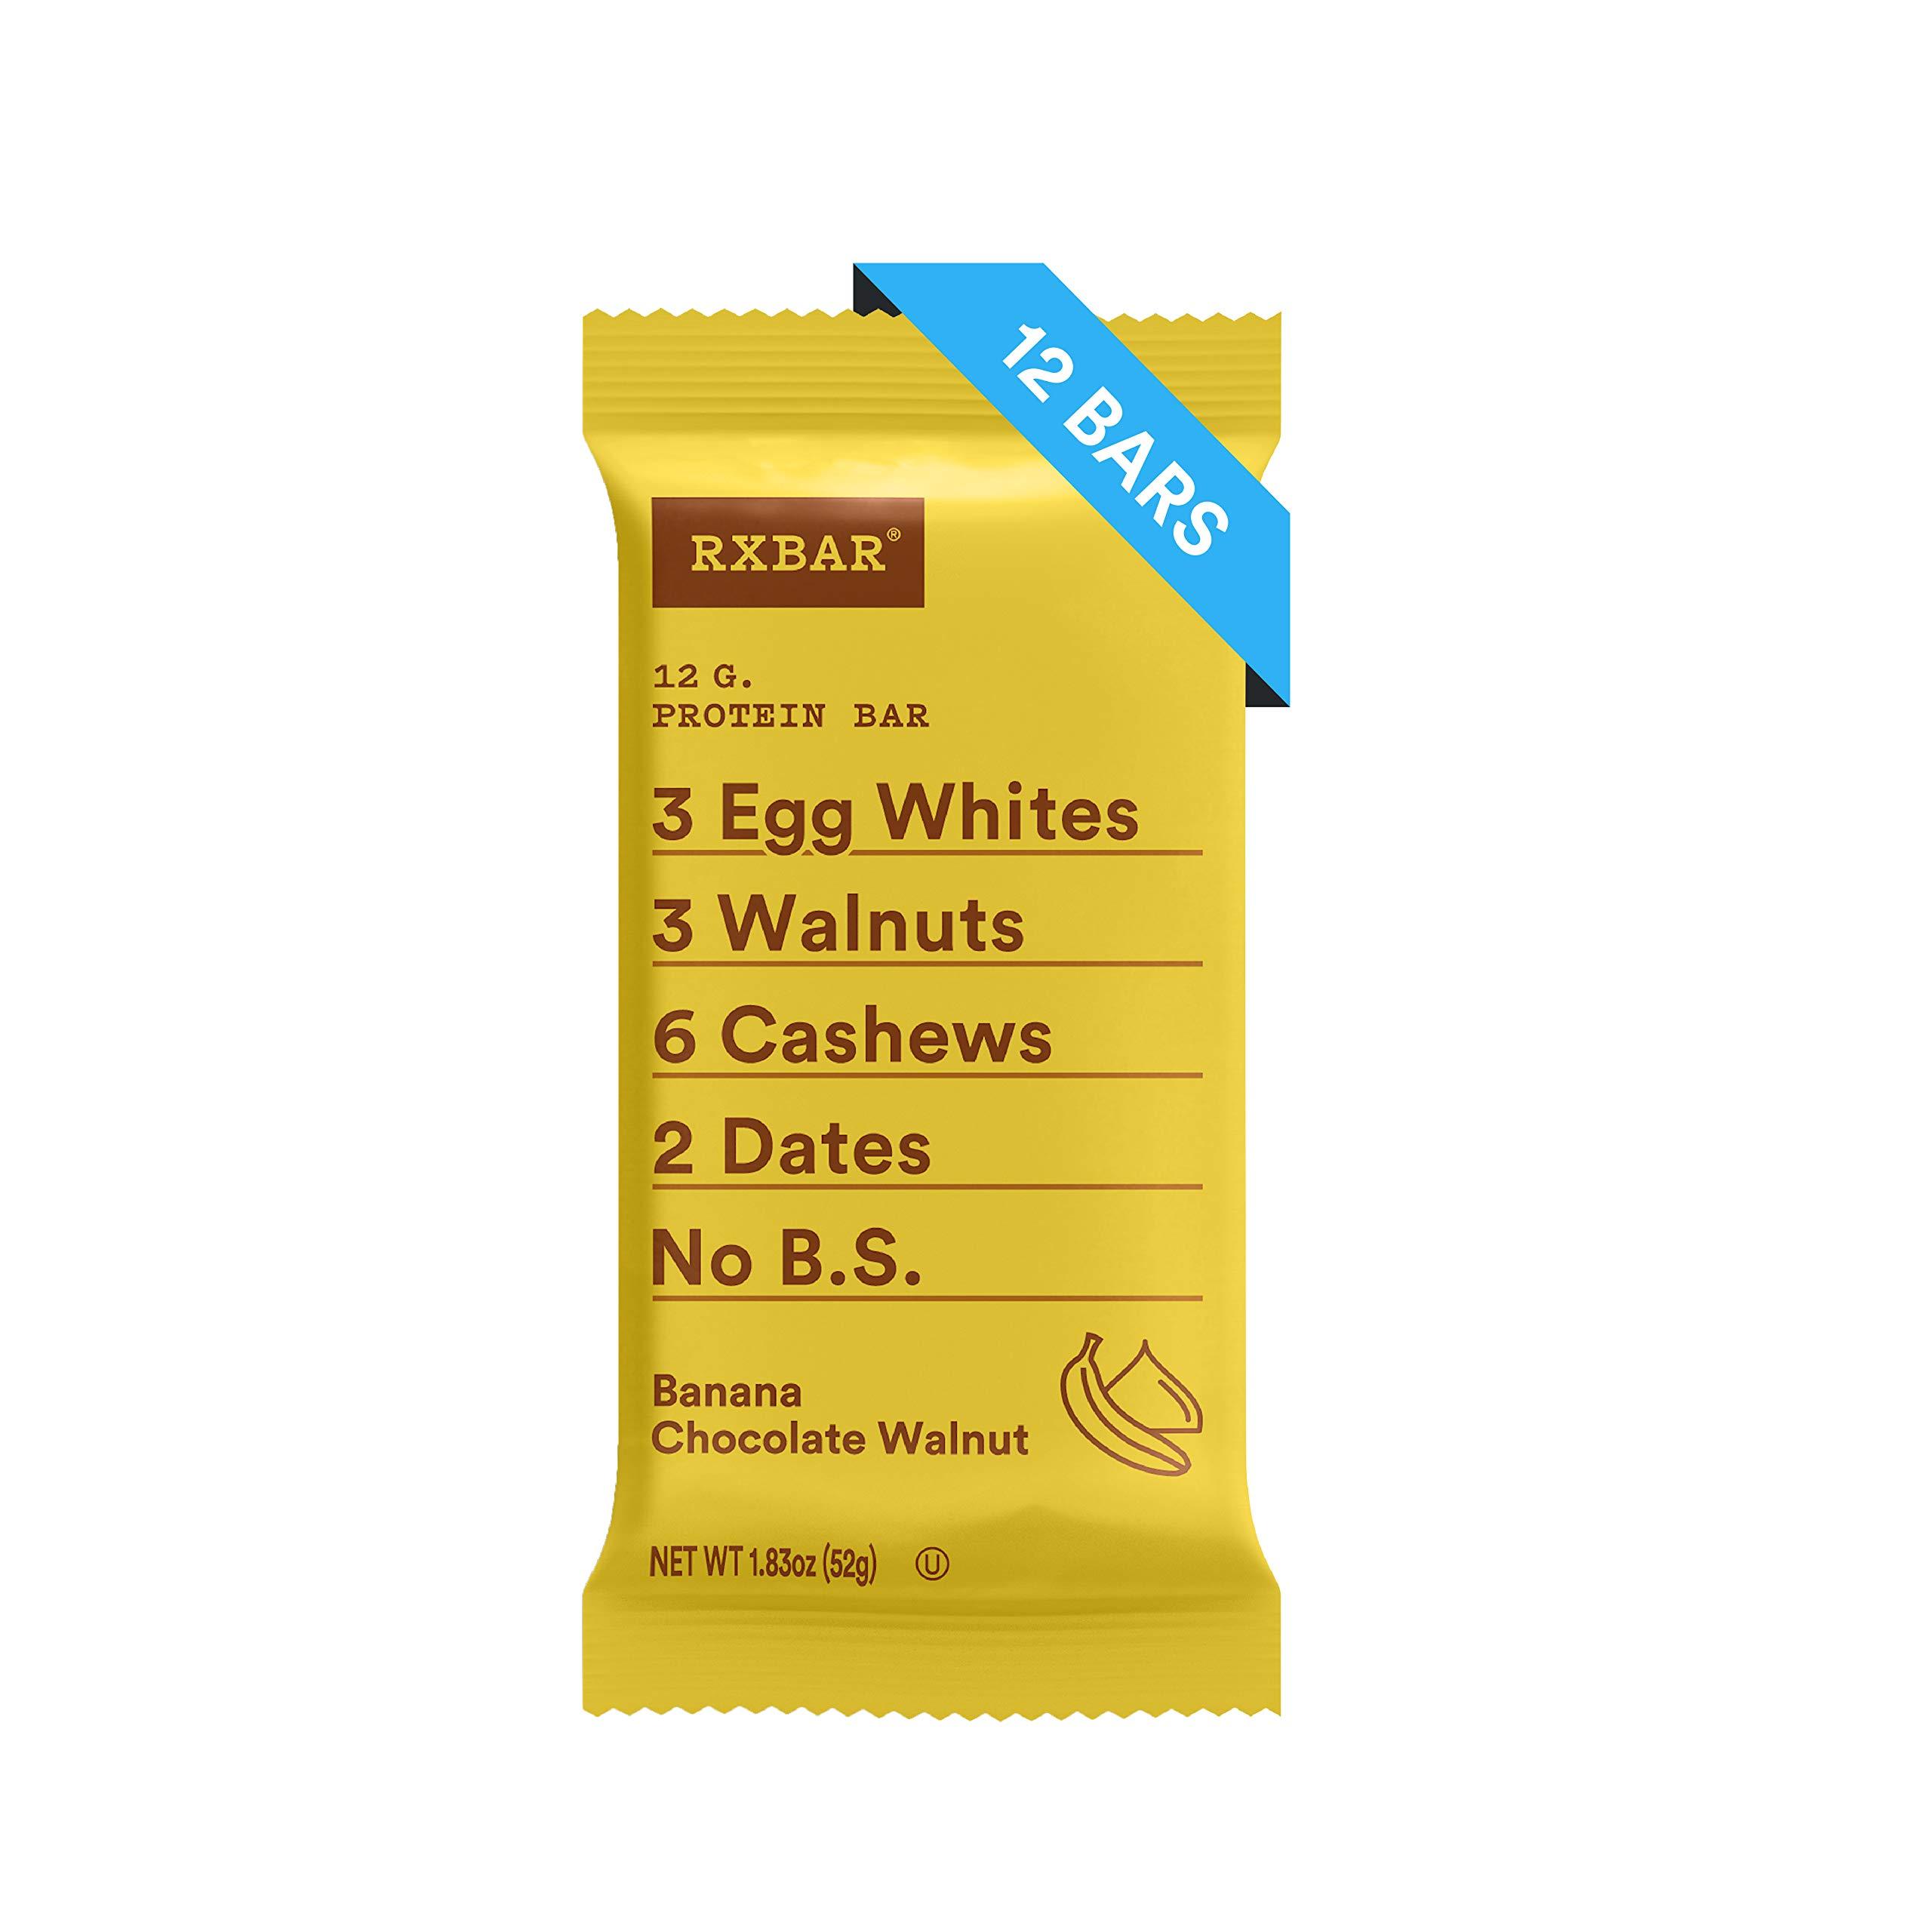 RXBAR, Banana Chocolate Walnut, Protein Bar, Breakfast Bar, High Protein Snack, 1.83 Ounce, Pack of 12 by RXBAR